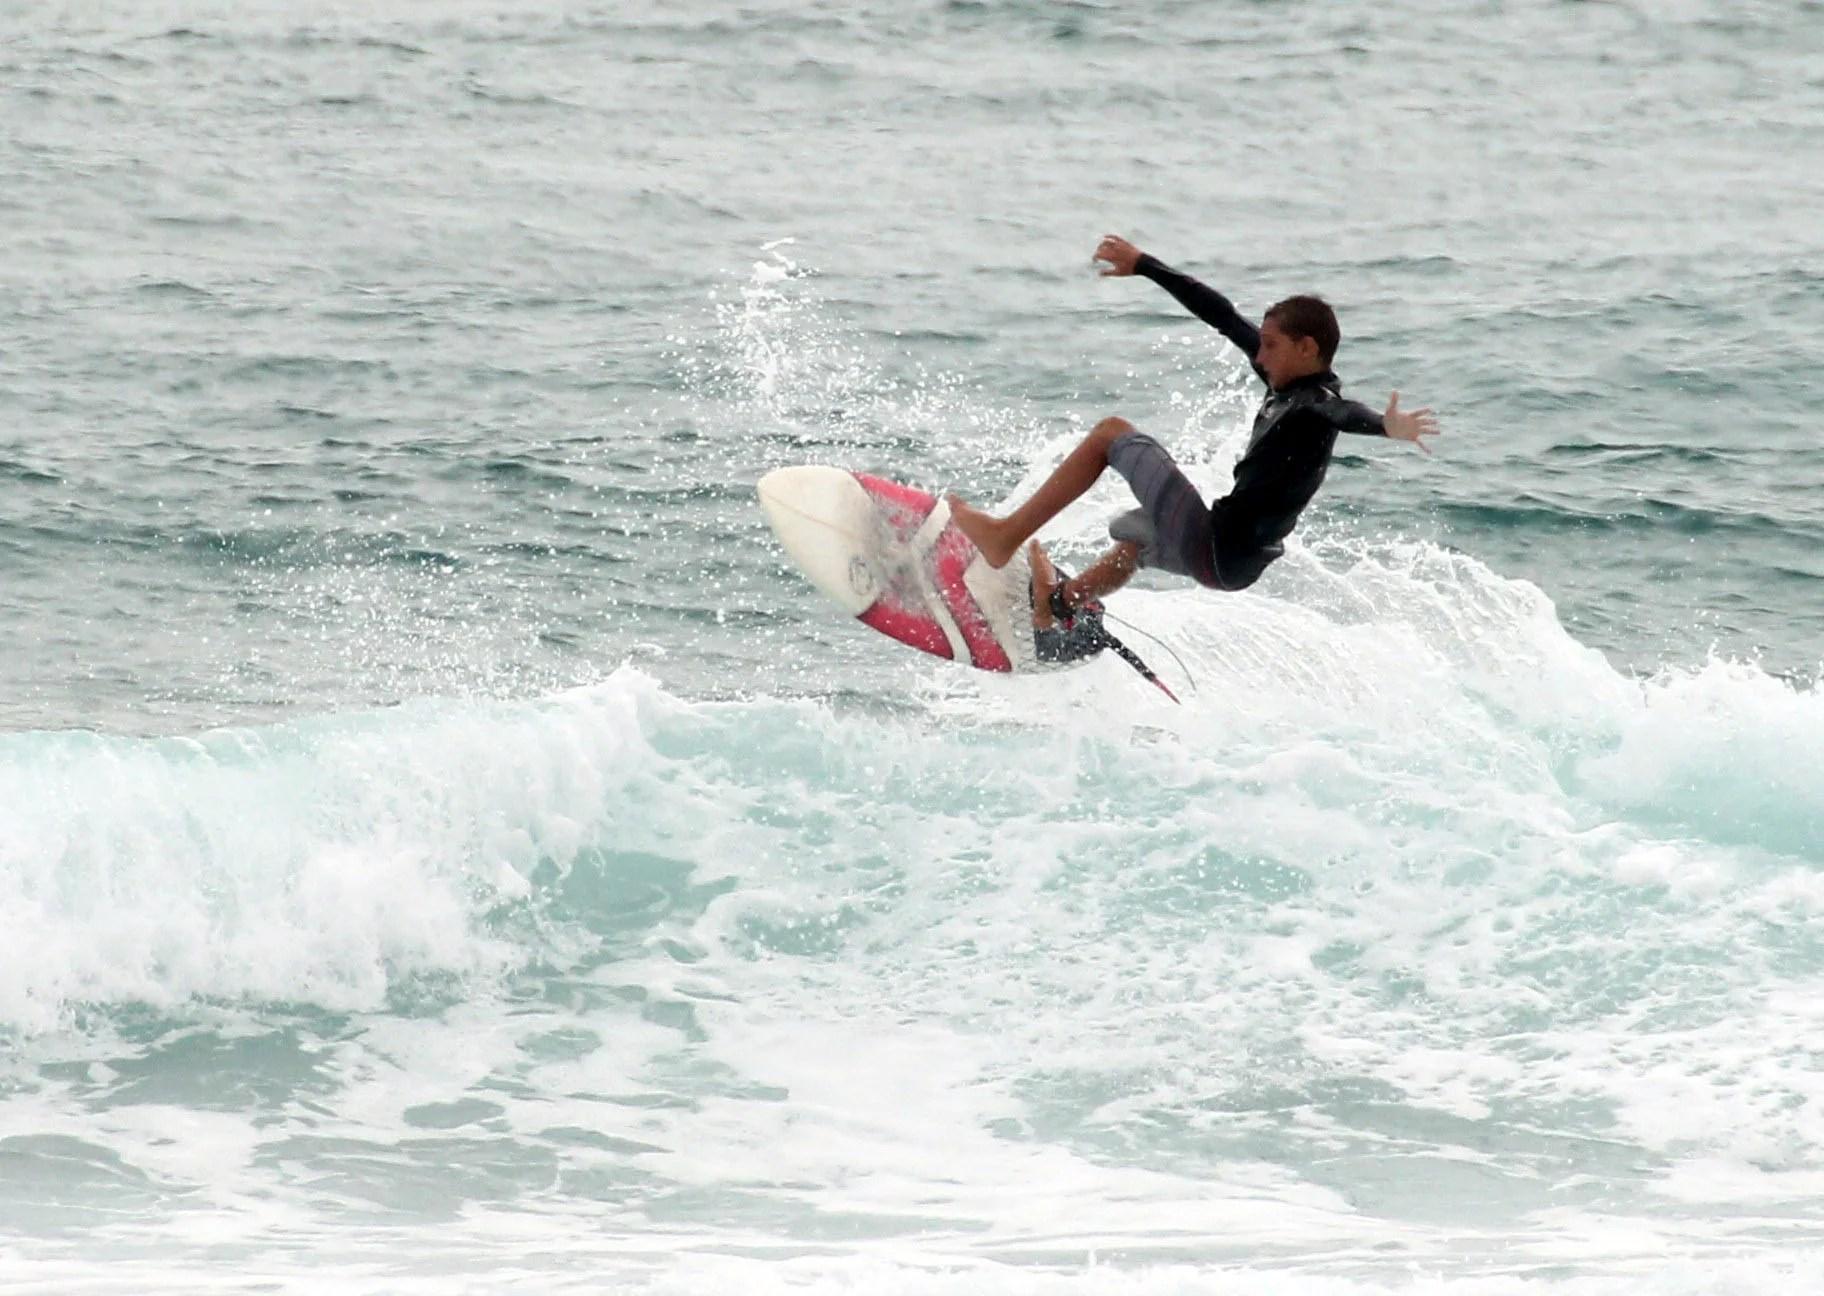 Surfing Tofo shorebreak